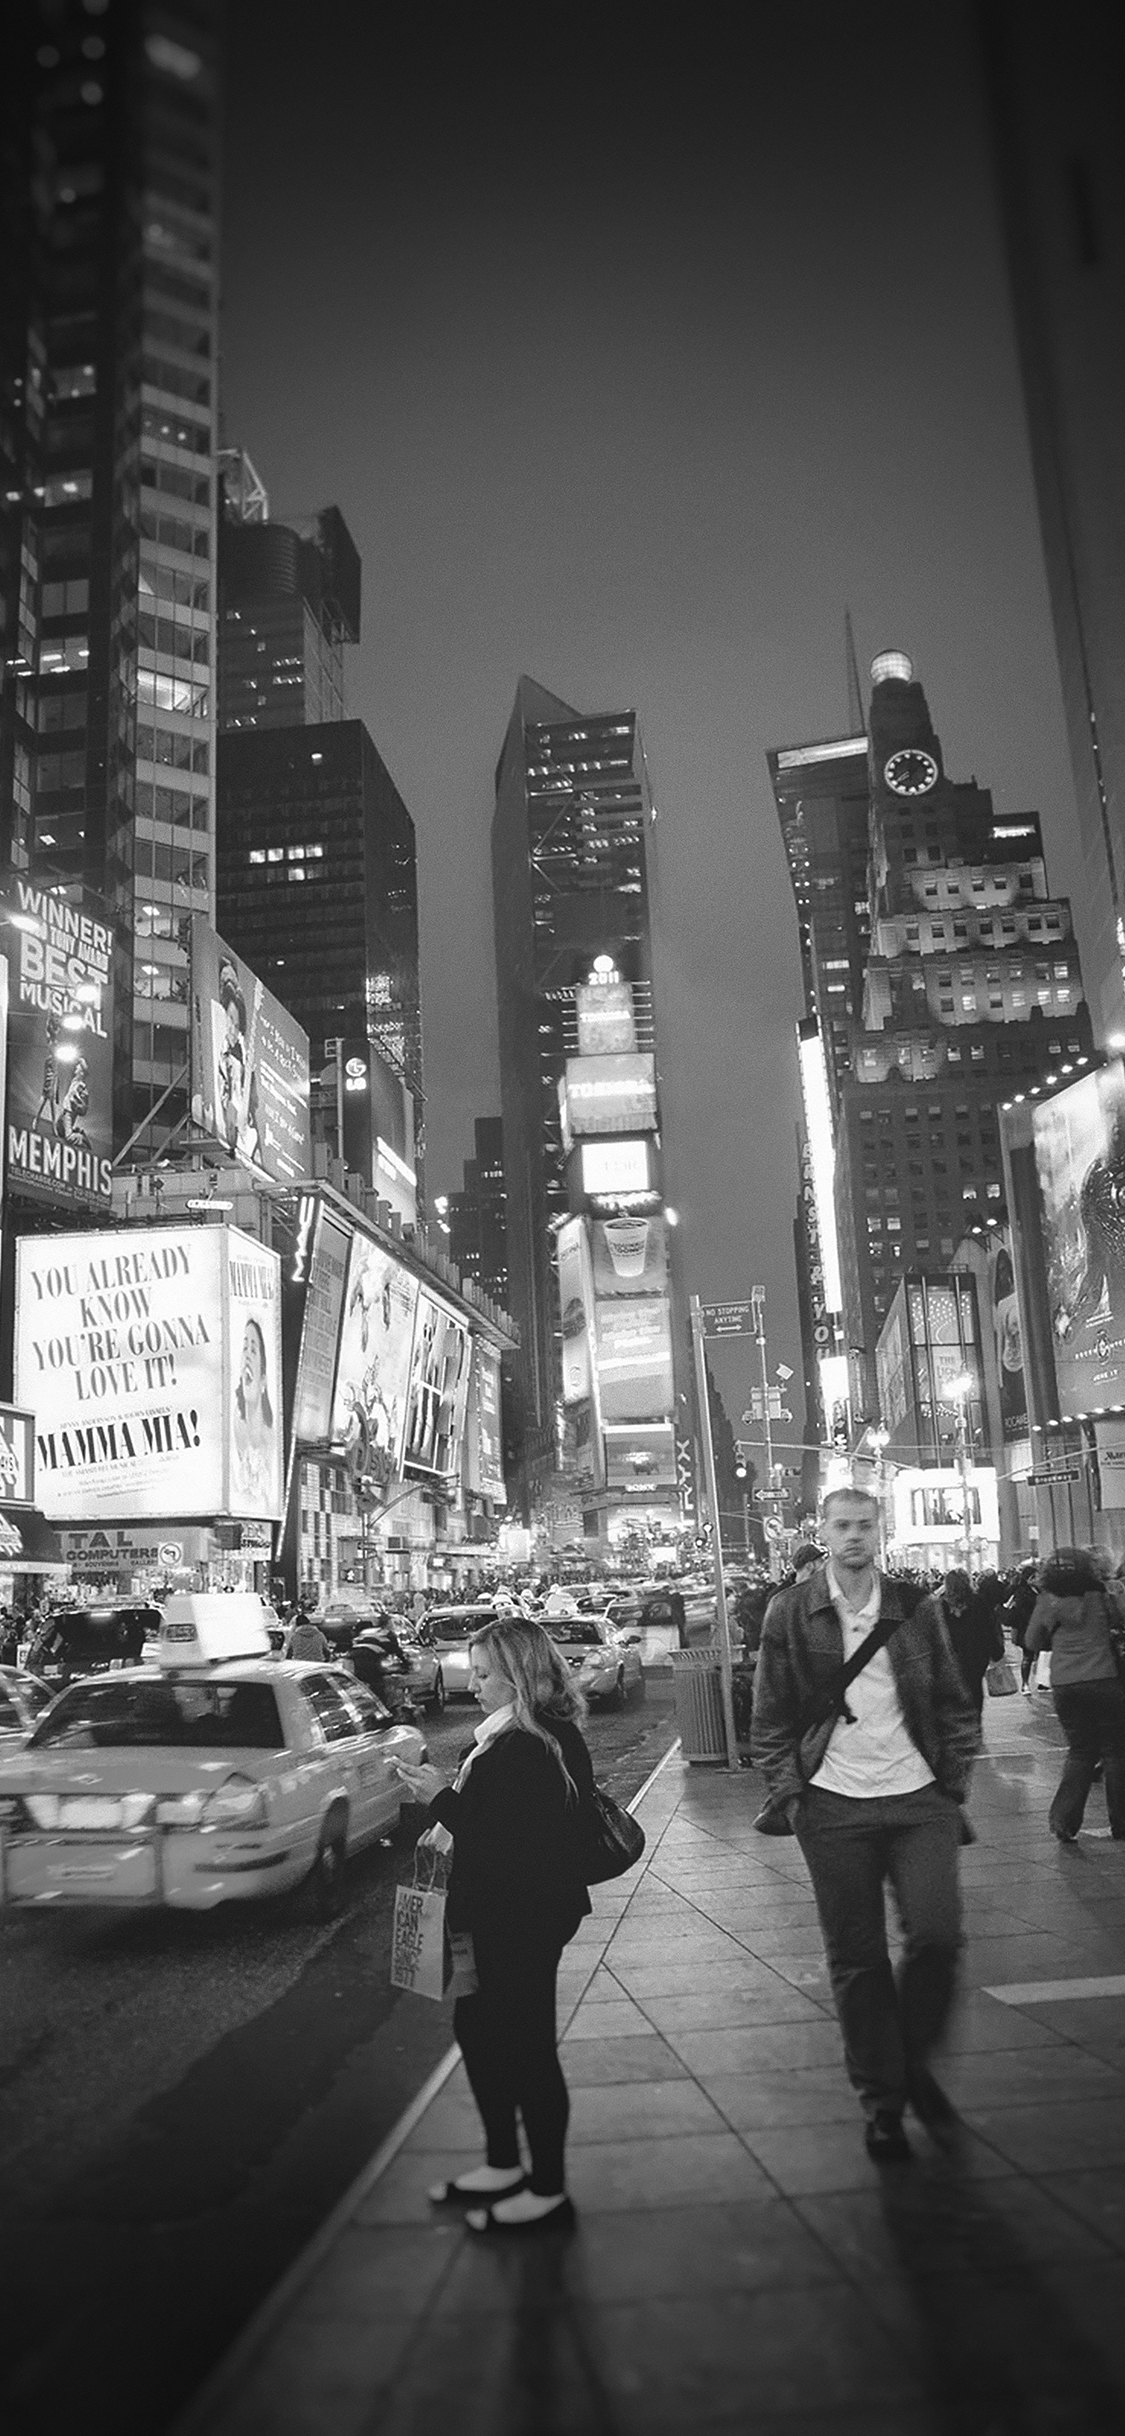 Mn66 New York Street Night City Dark Bw Vignette Papers Co